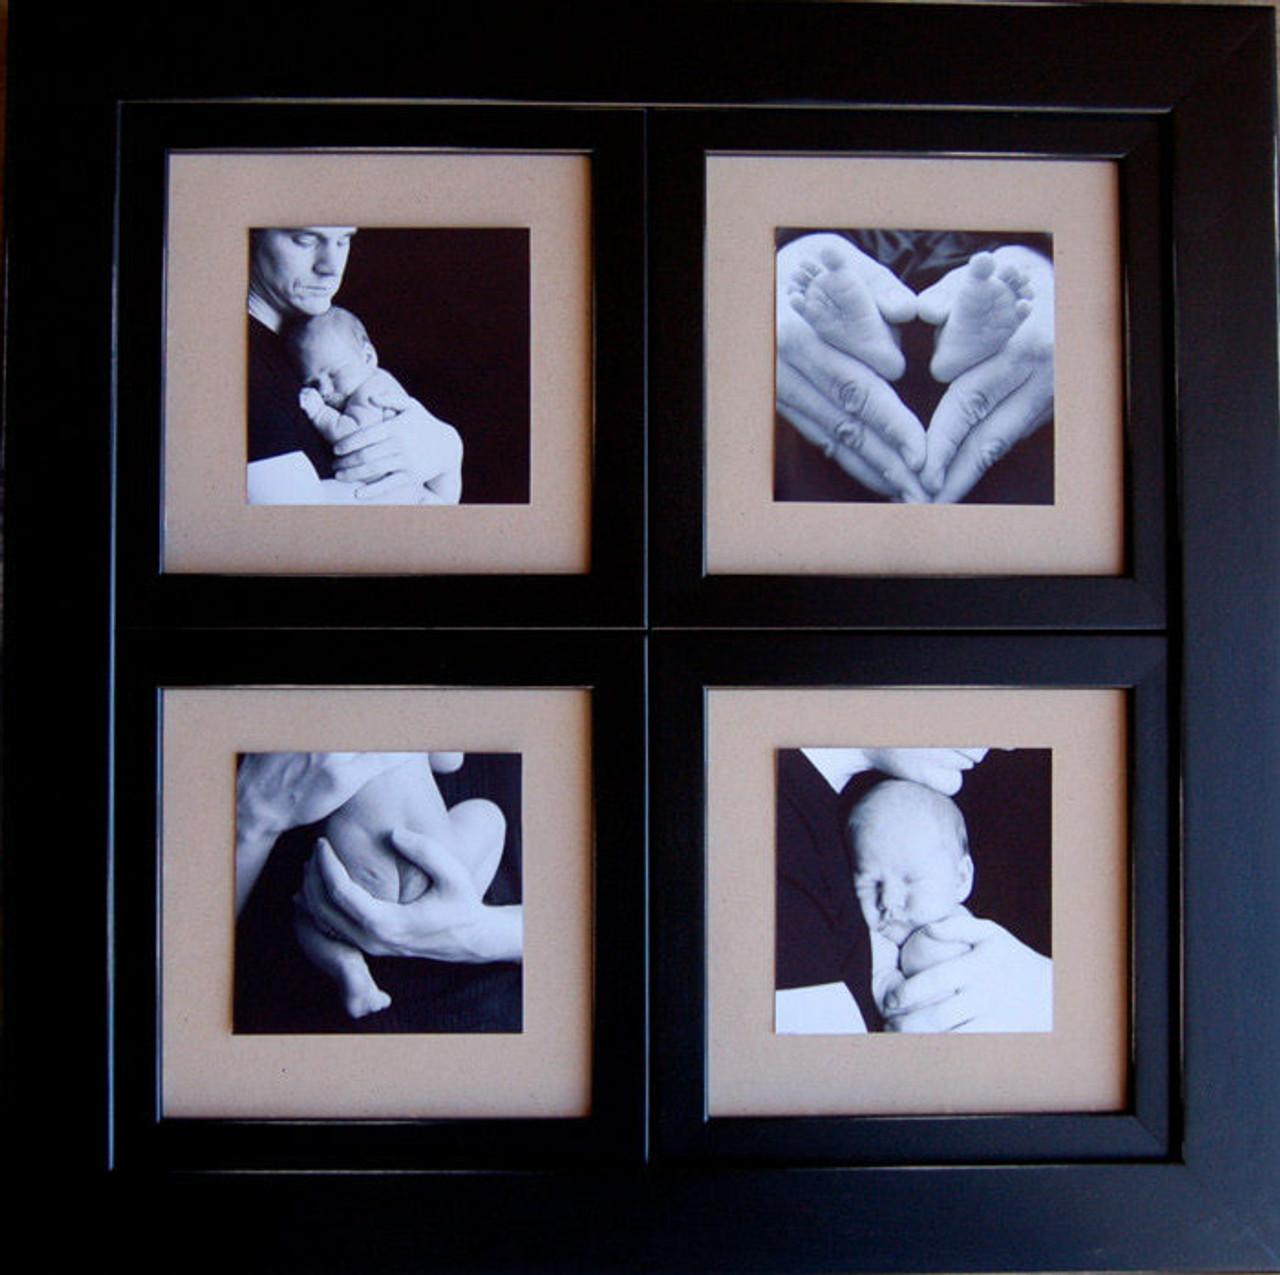 Window Pane Collage Frame Black Wood 8x8 Four Openings